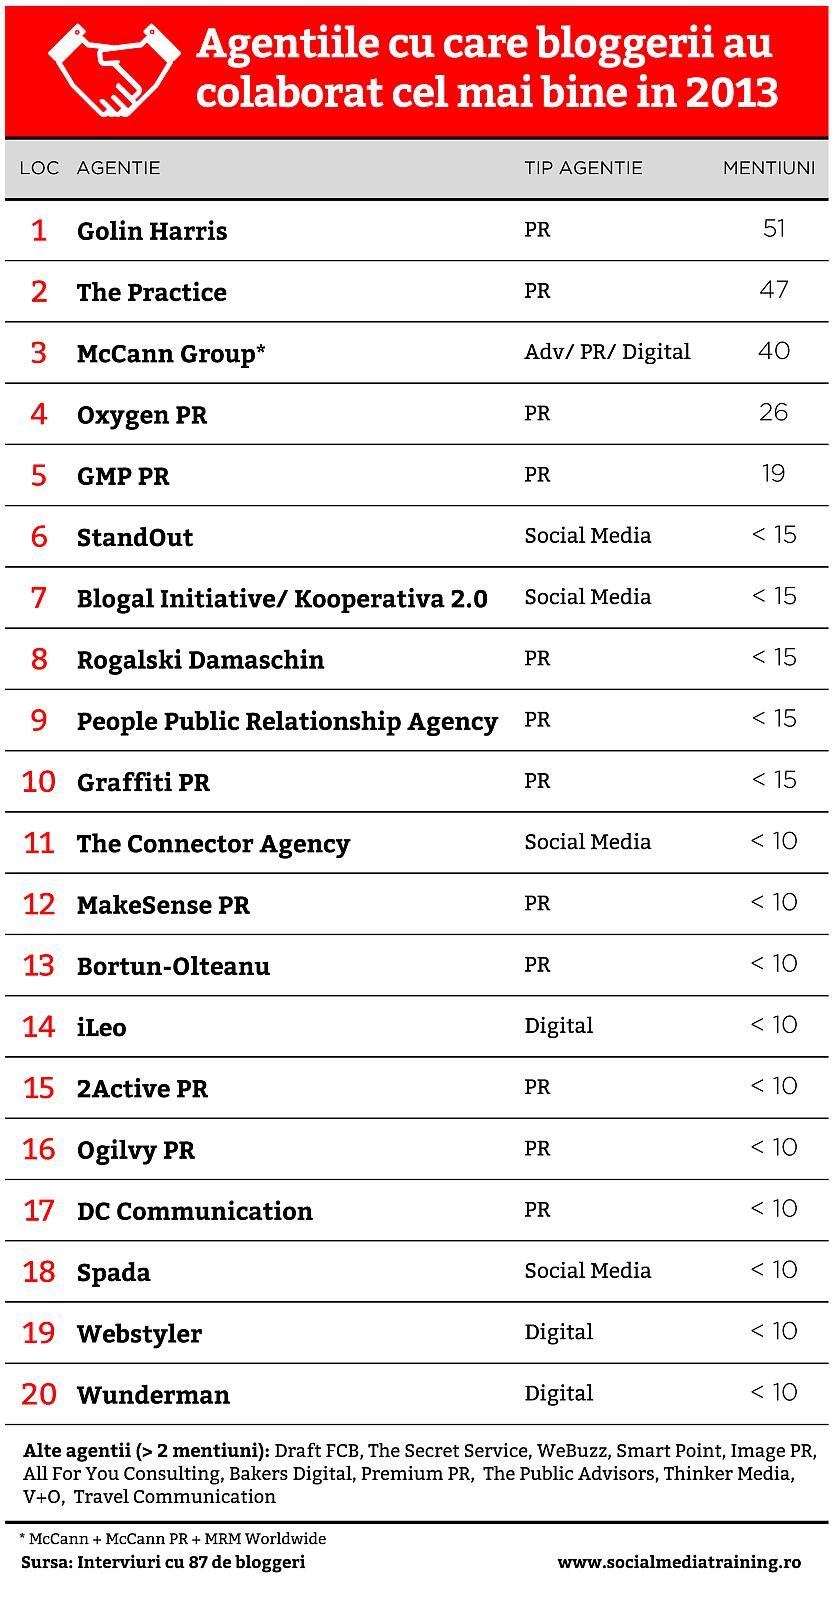 Top_Agentii_in_Blogosfera_2014